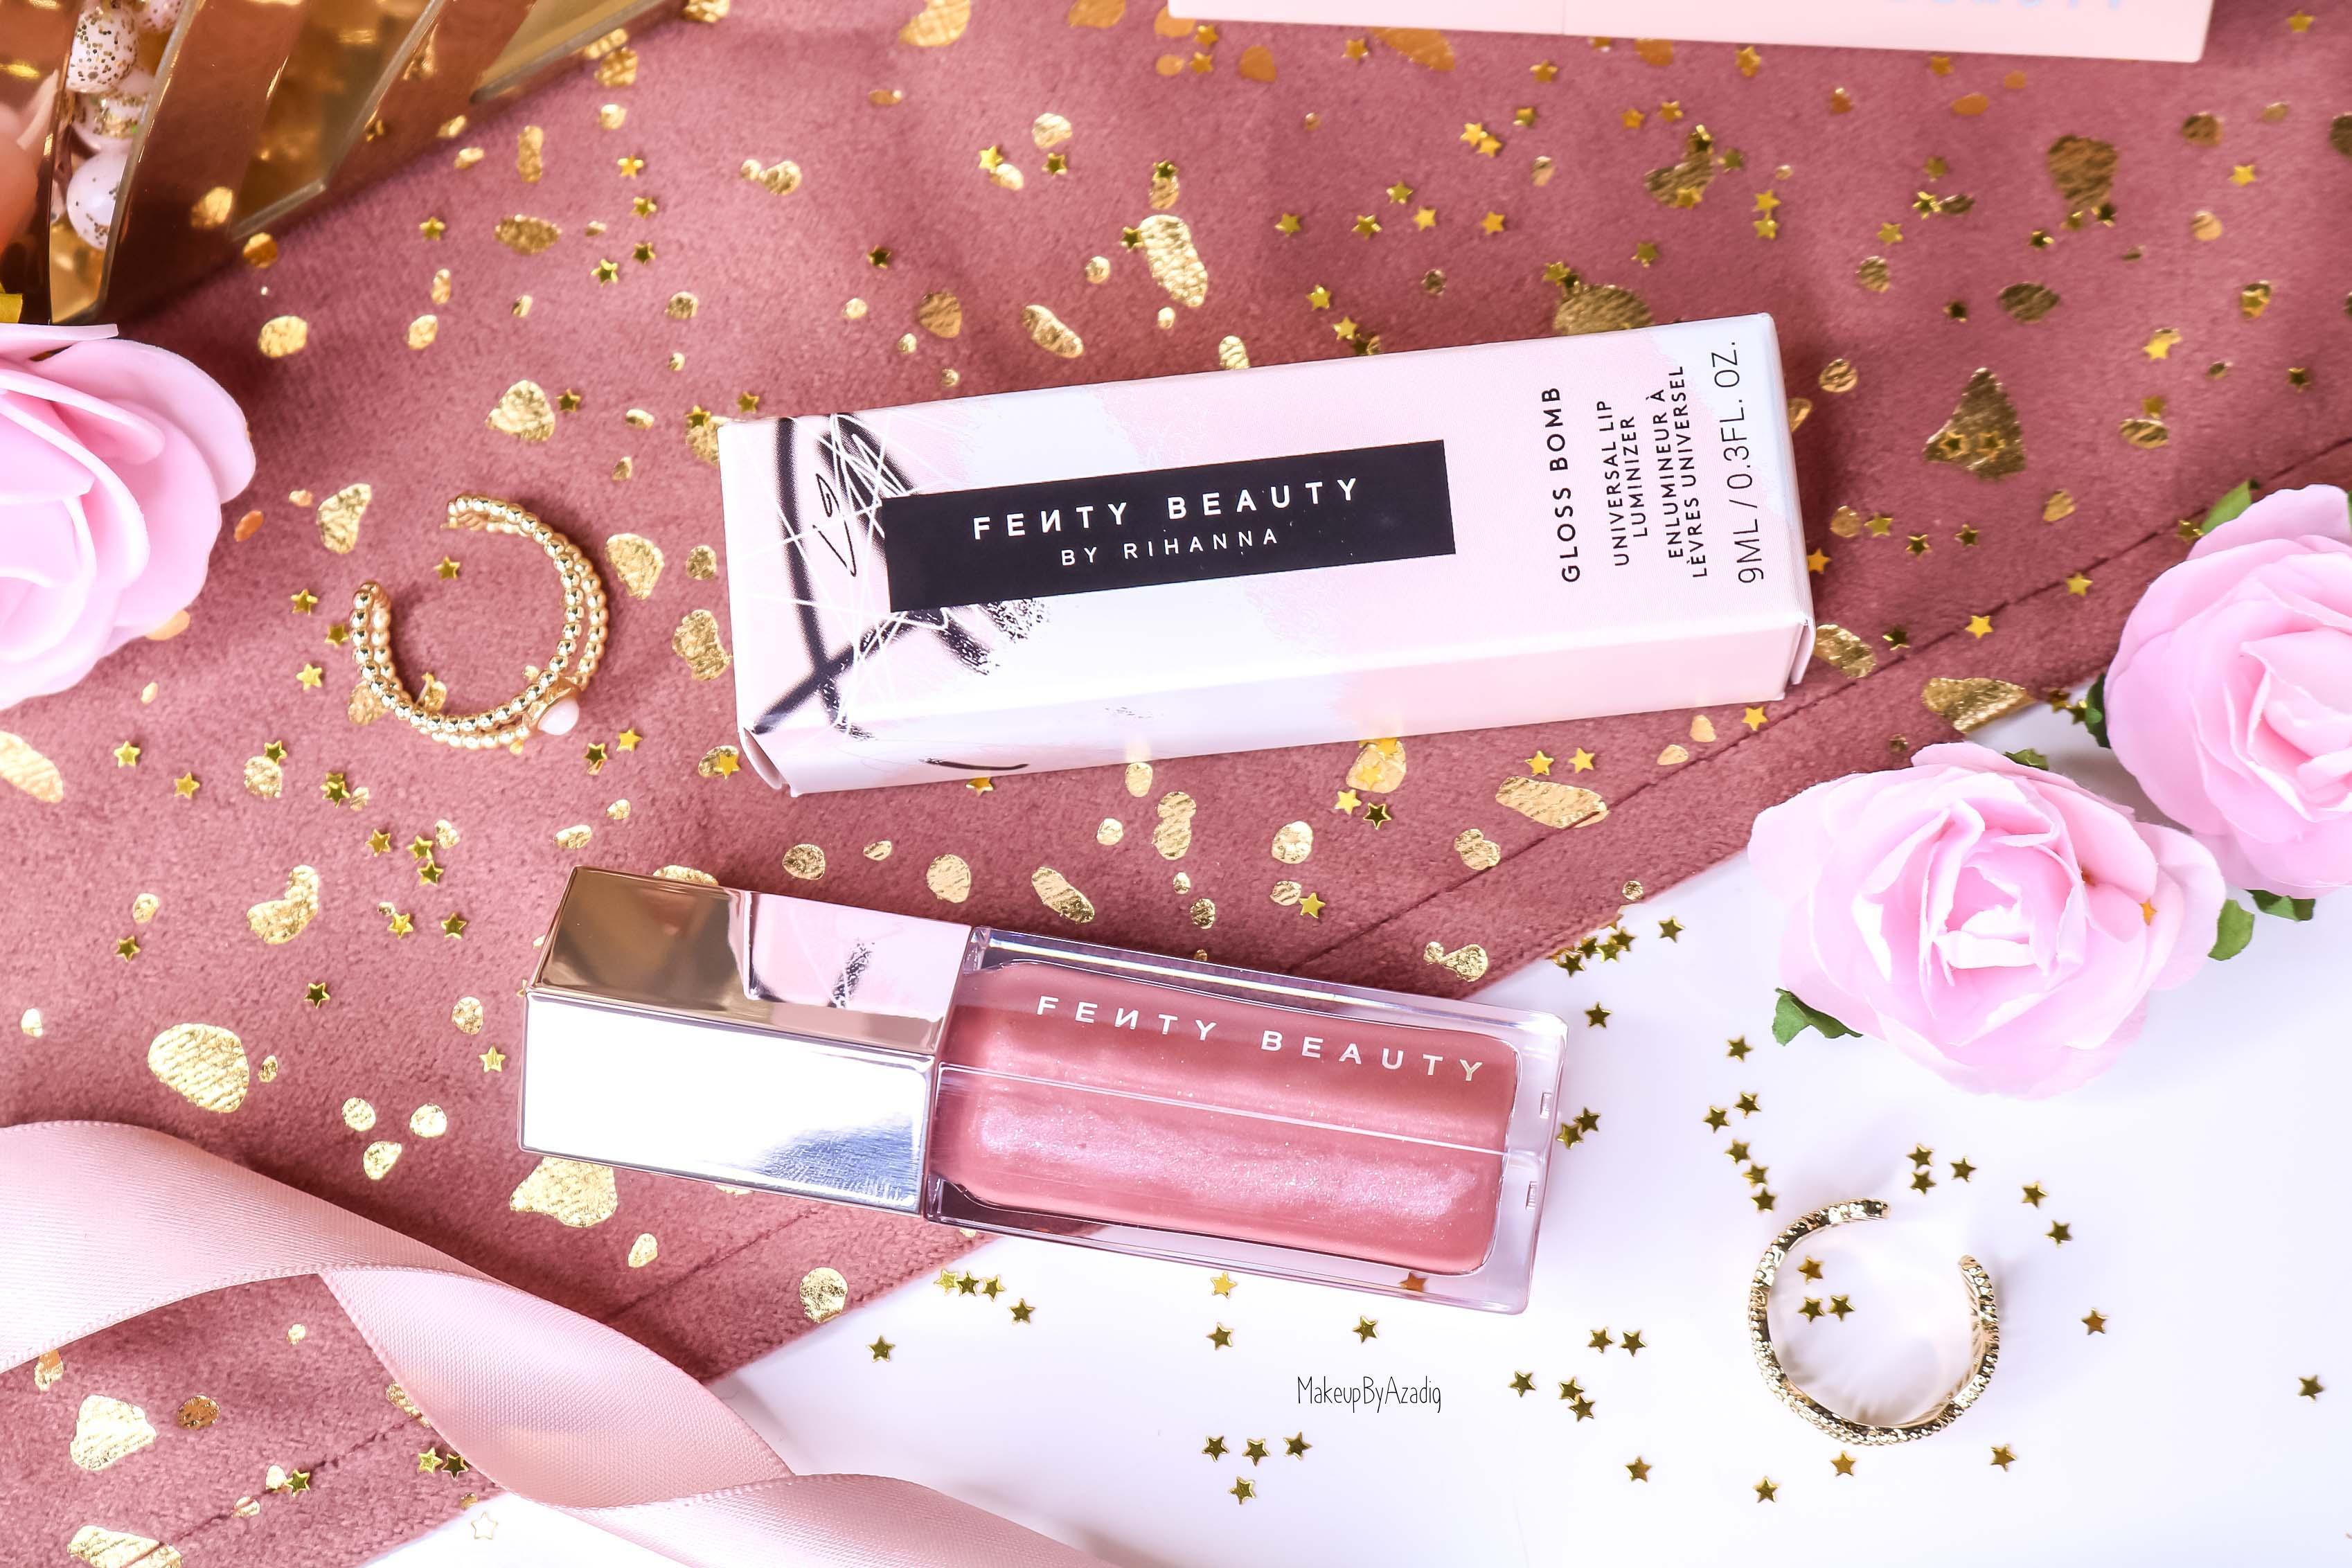 revue-gloss-levres-elumineur-universel-gloss-bomb-fussy-fenty-beauty-paris-rihanna-makeupbyazadig-lip-avis-prix-swatch-miniature